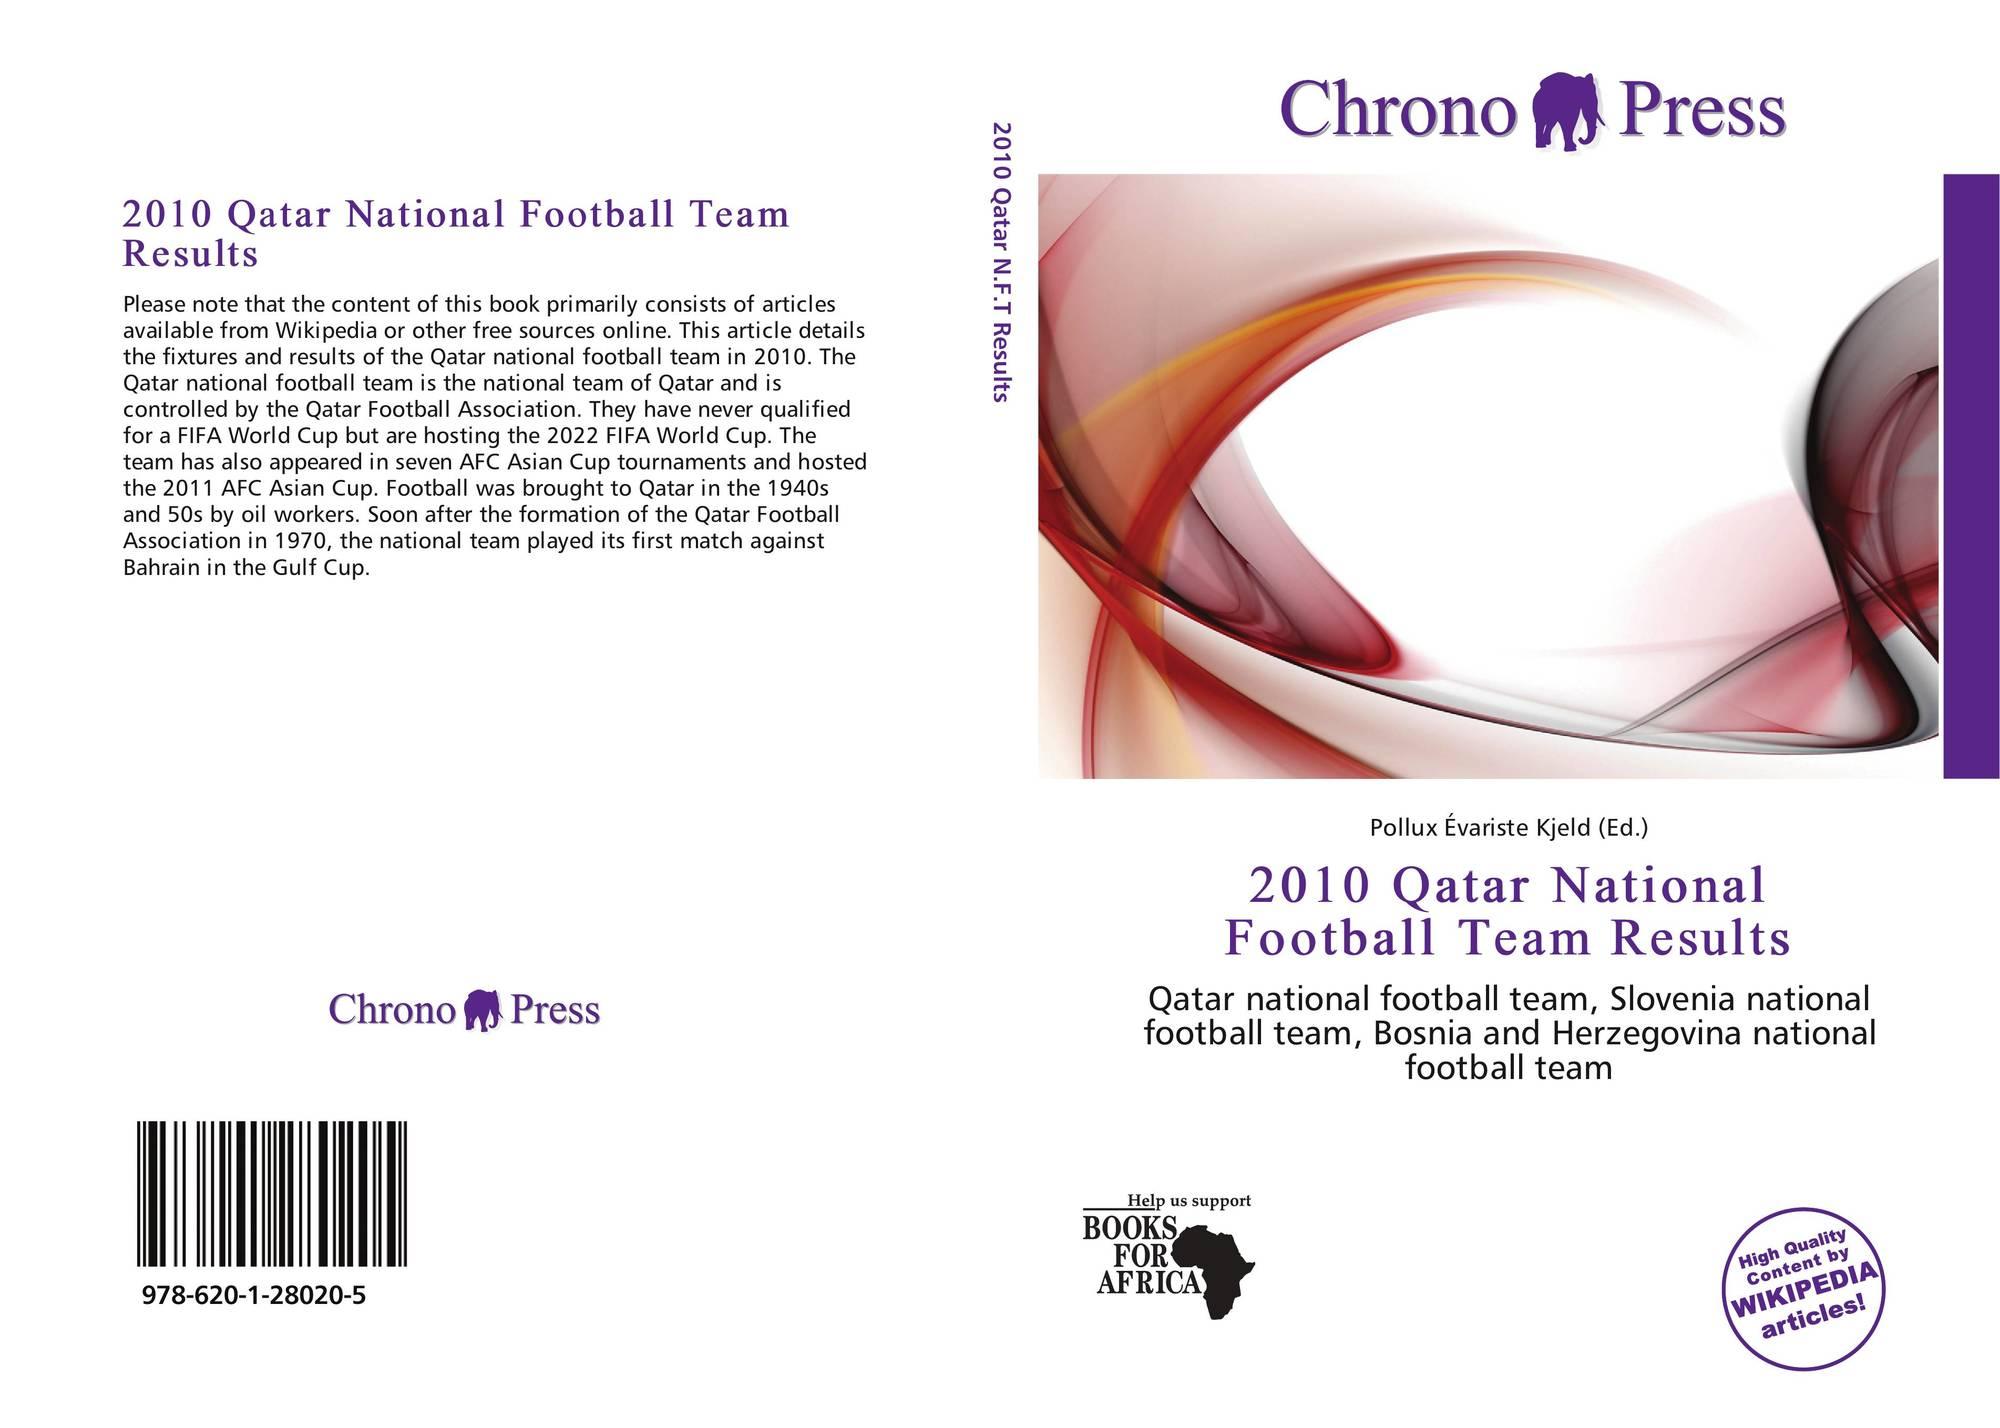 2010 Qatar National Football Team Results, 978-620-1-28020-5